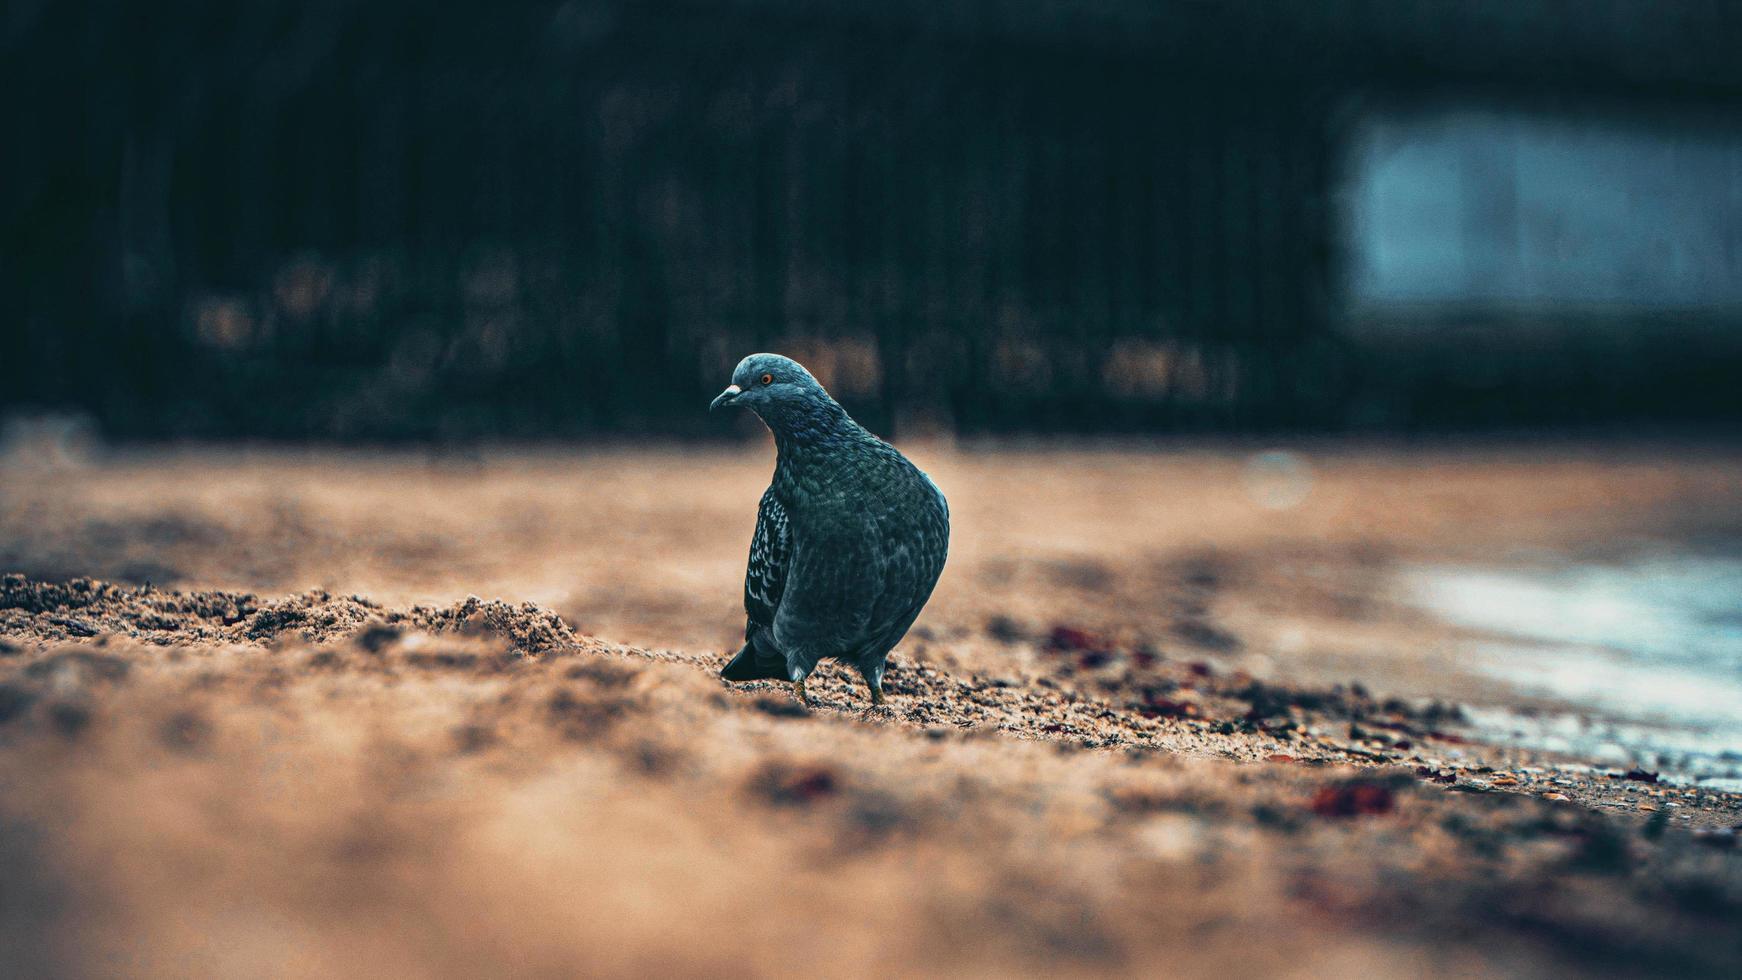 paloma caminando por la playa foto